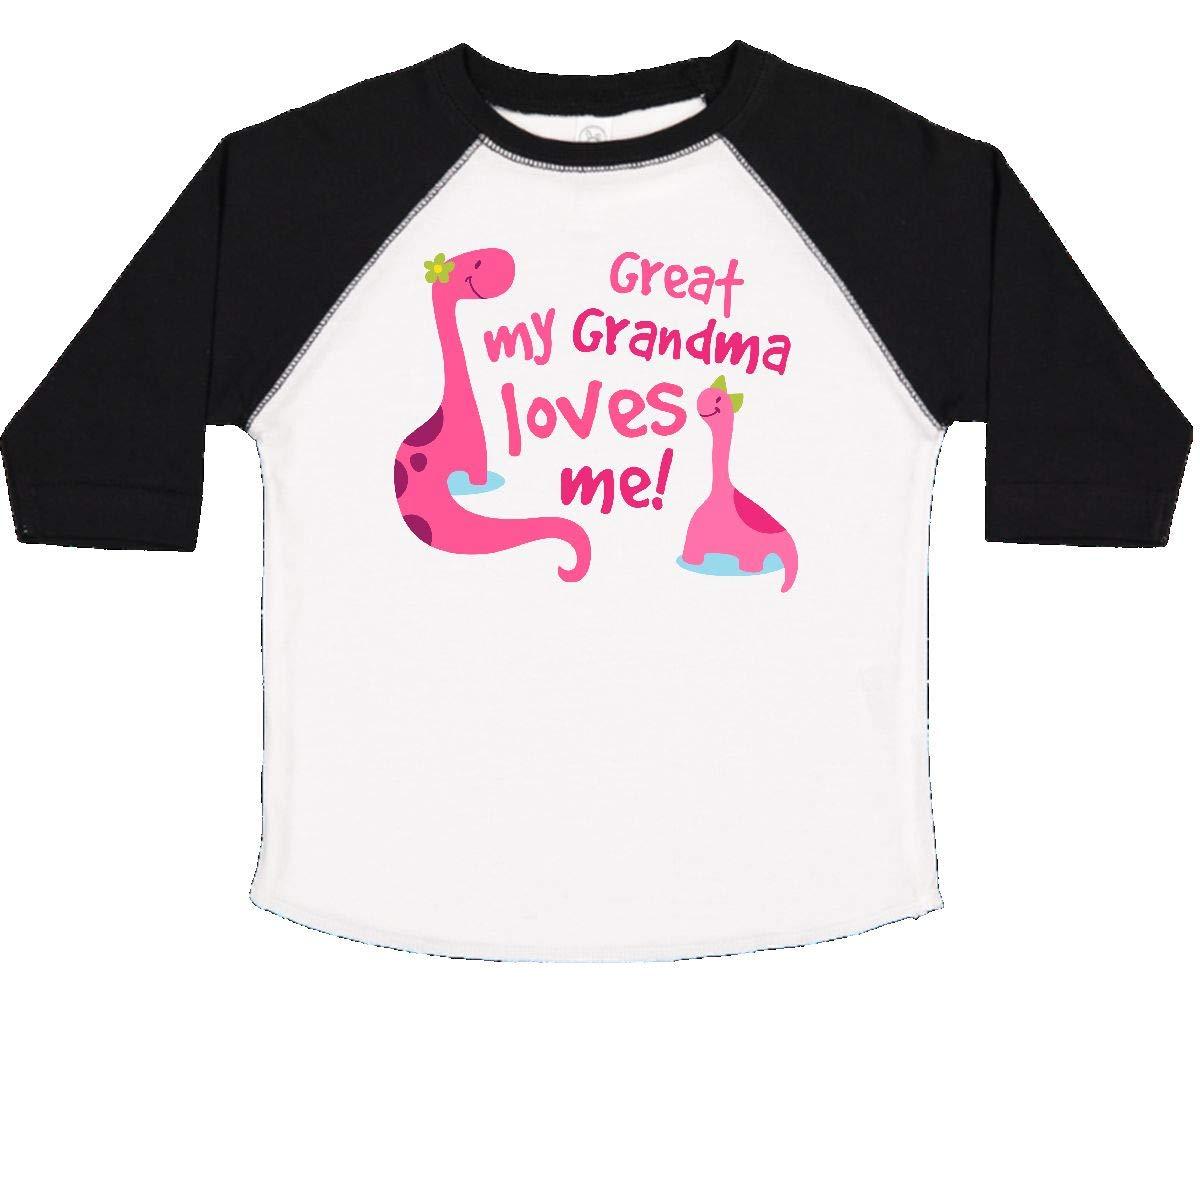 Great Grandma Loves Me Granddaughter Toddler T-Shirt 2059e inktastic